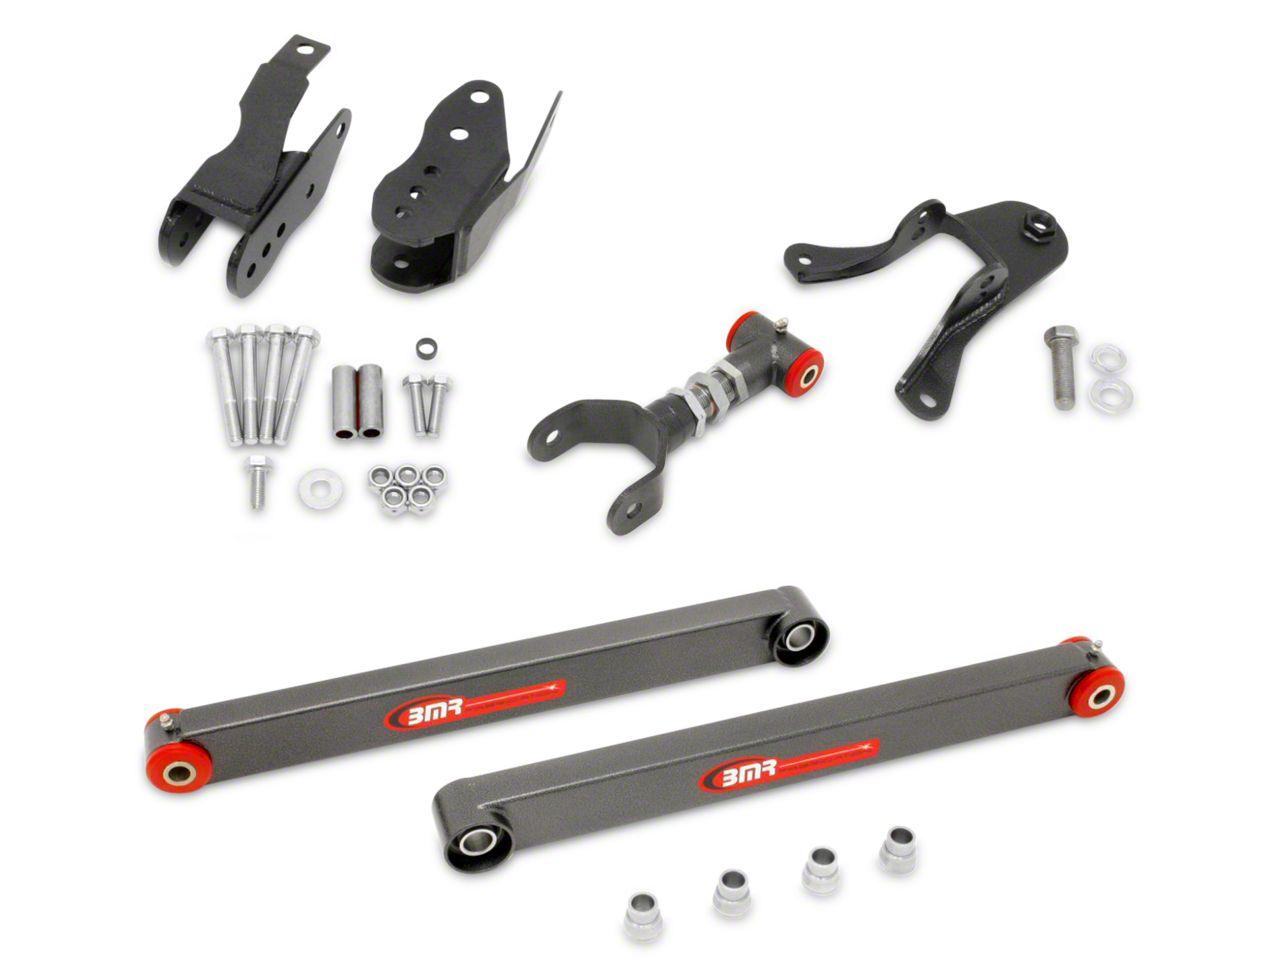 BMR Level 3 Rear Control Arm Package - Hammertone (05-10 All)